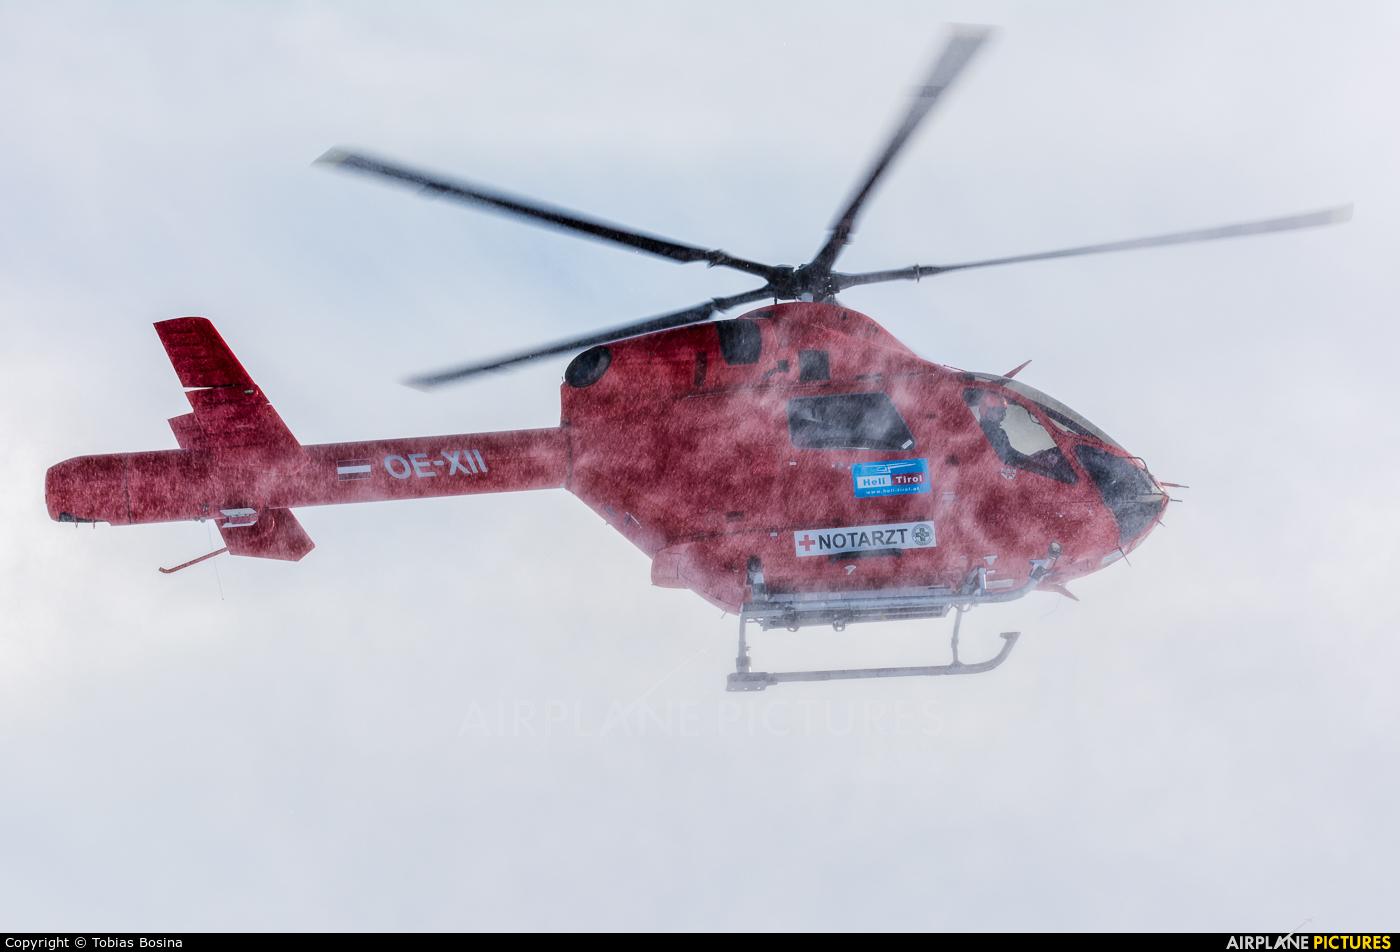 Heli Tirol OE-XII aircraft at Off Airport - Austria